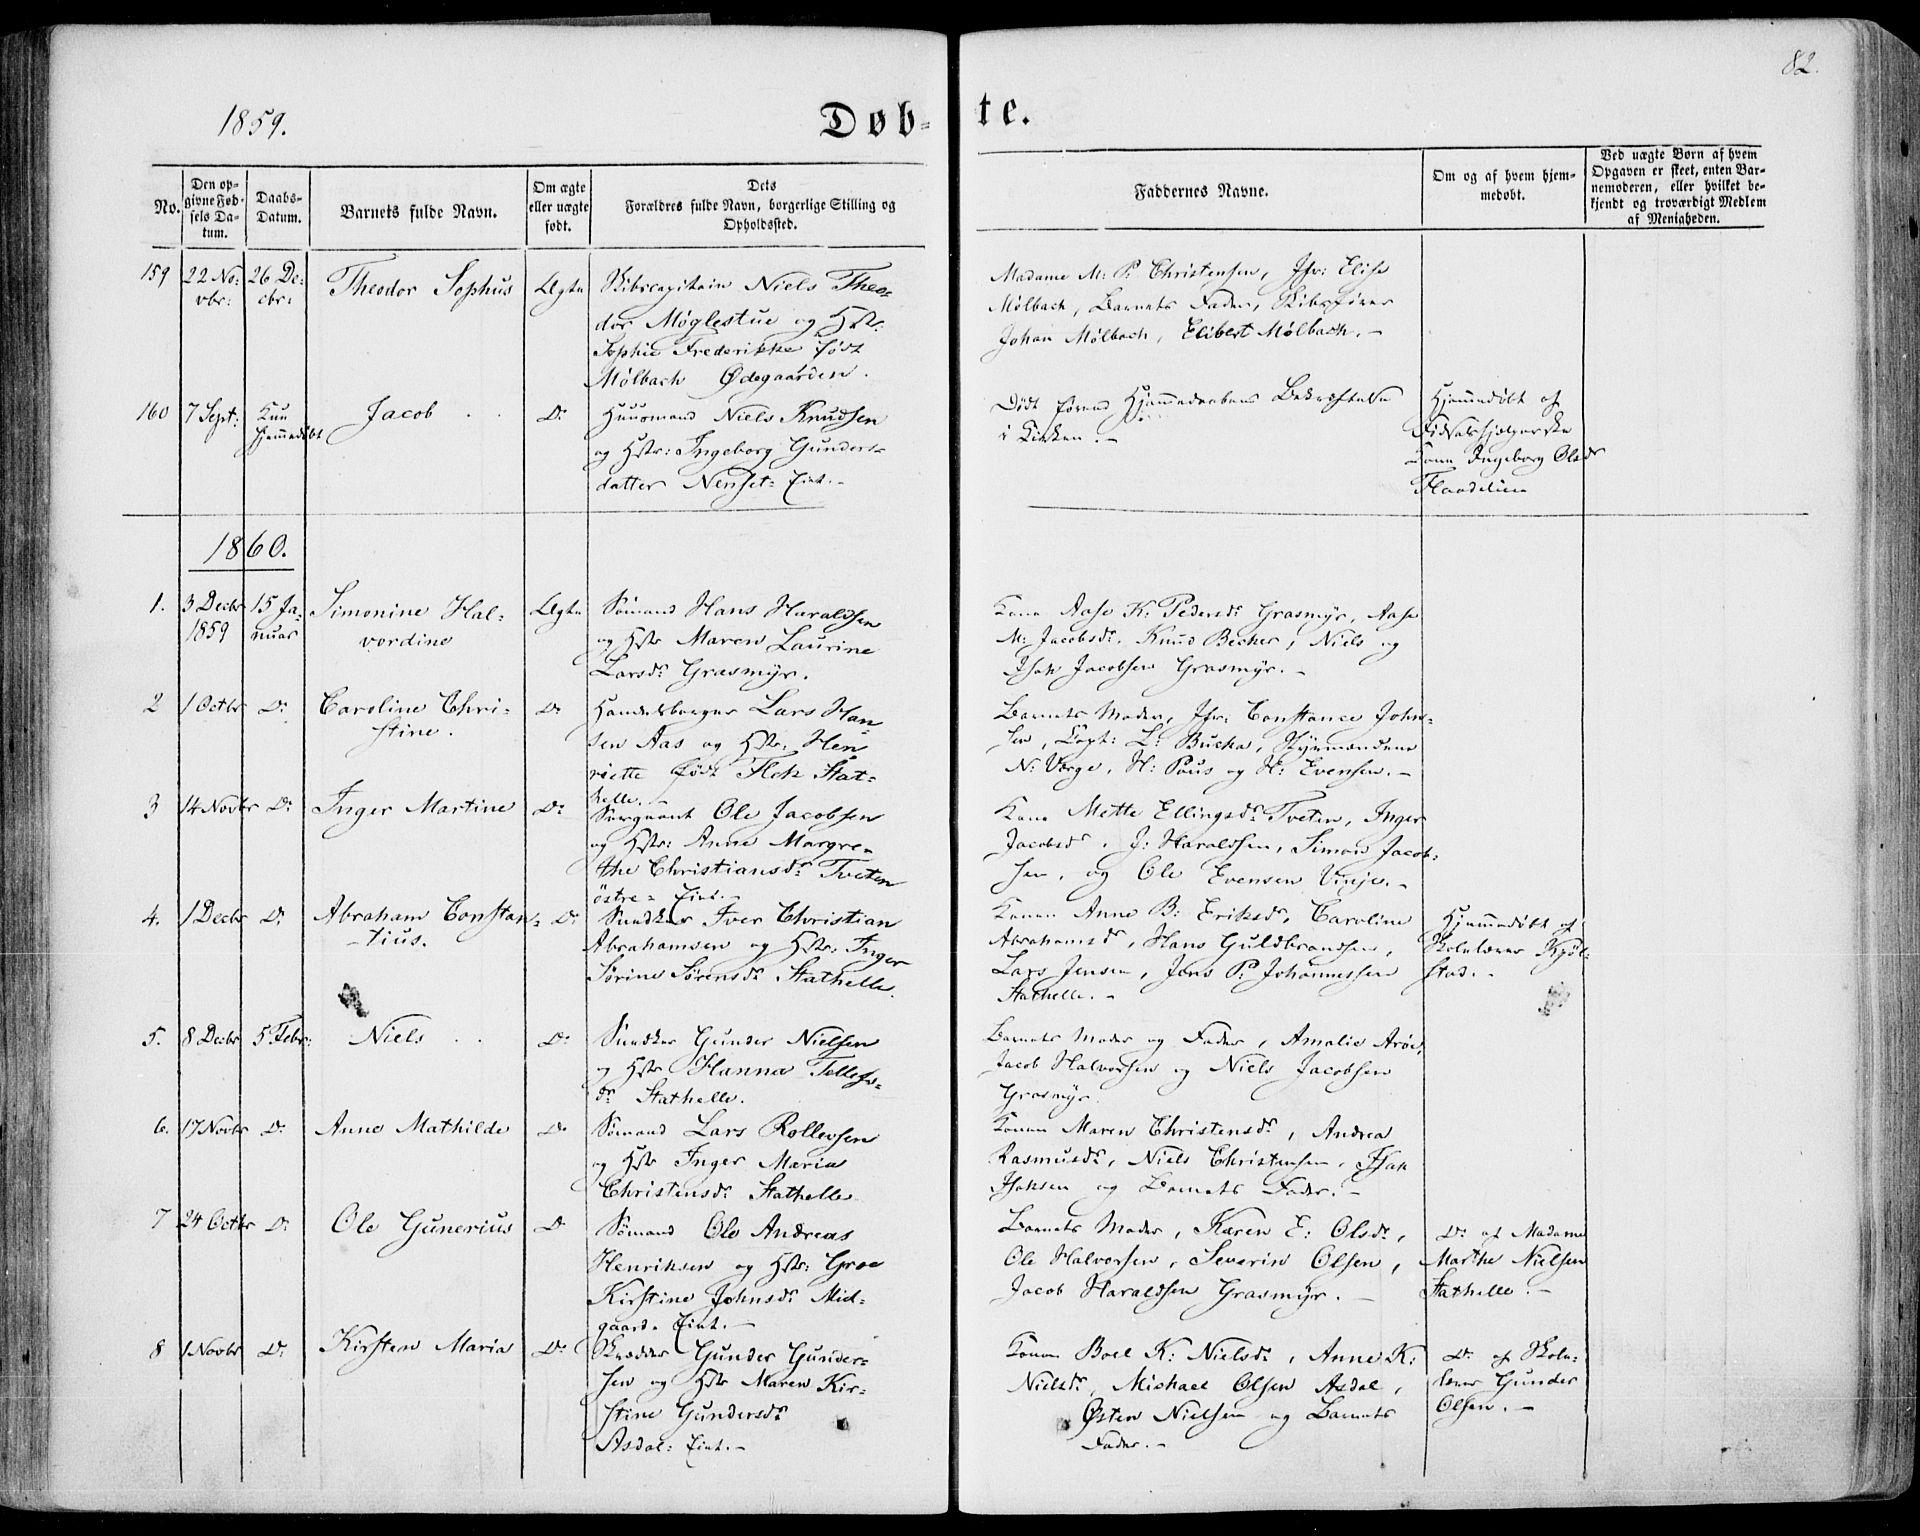 SAKO, Bamble kirkebøker, F/Fa/L0005: Ministerialbok nr. I 5, 1854-1869, s. 82